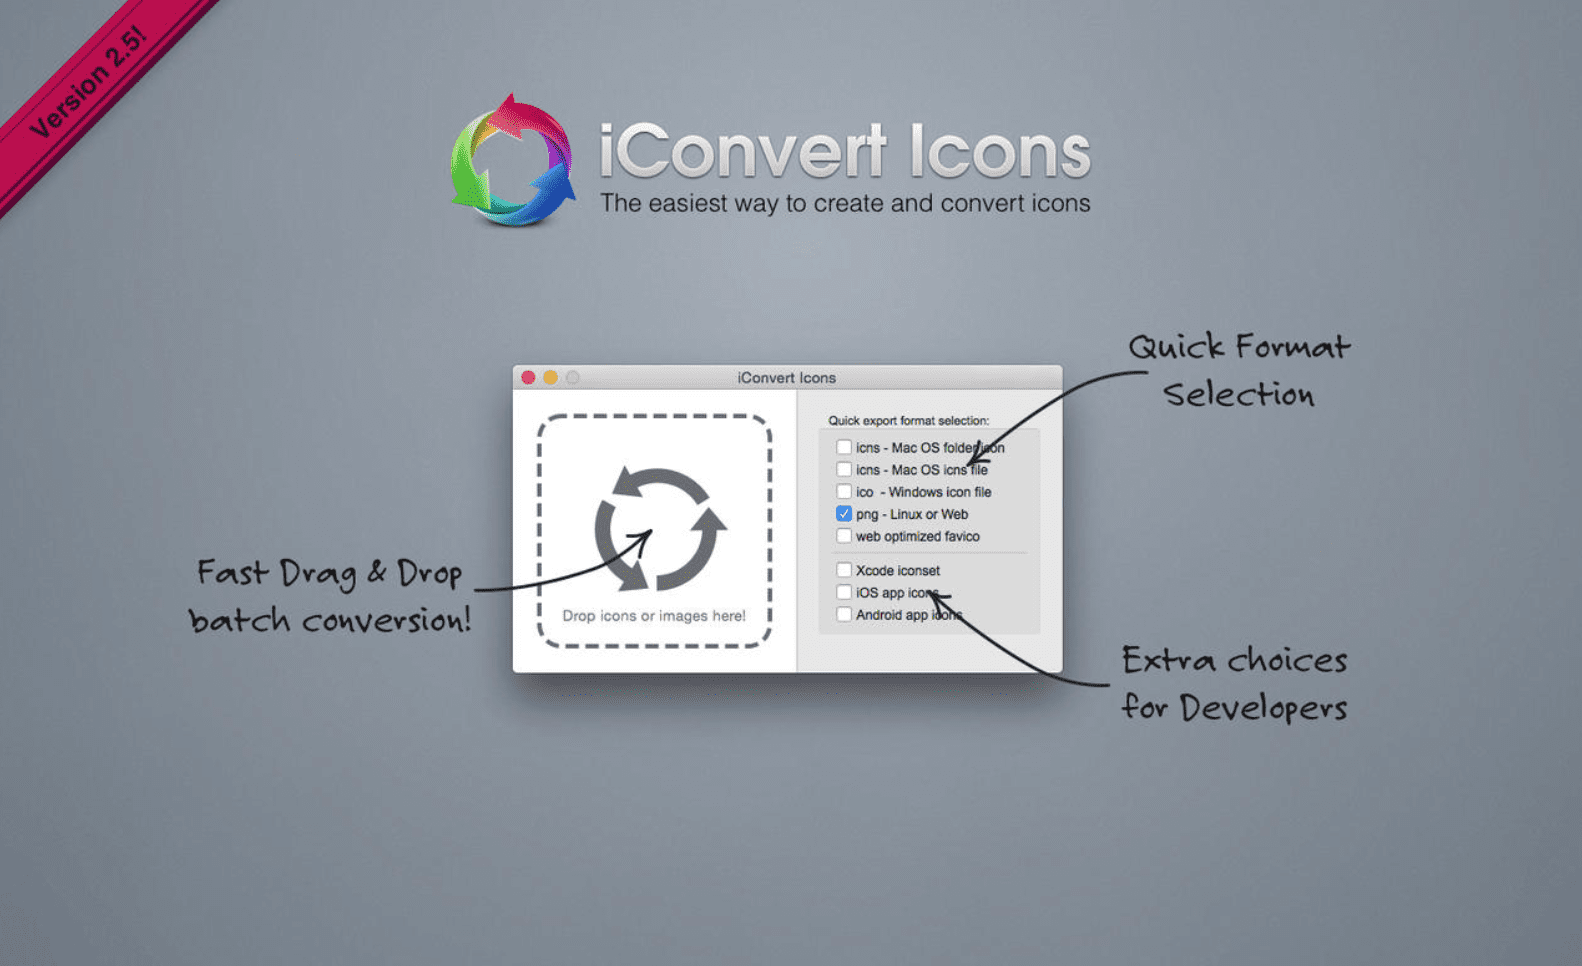 iConvert Icons Top